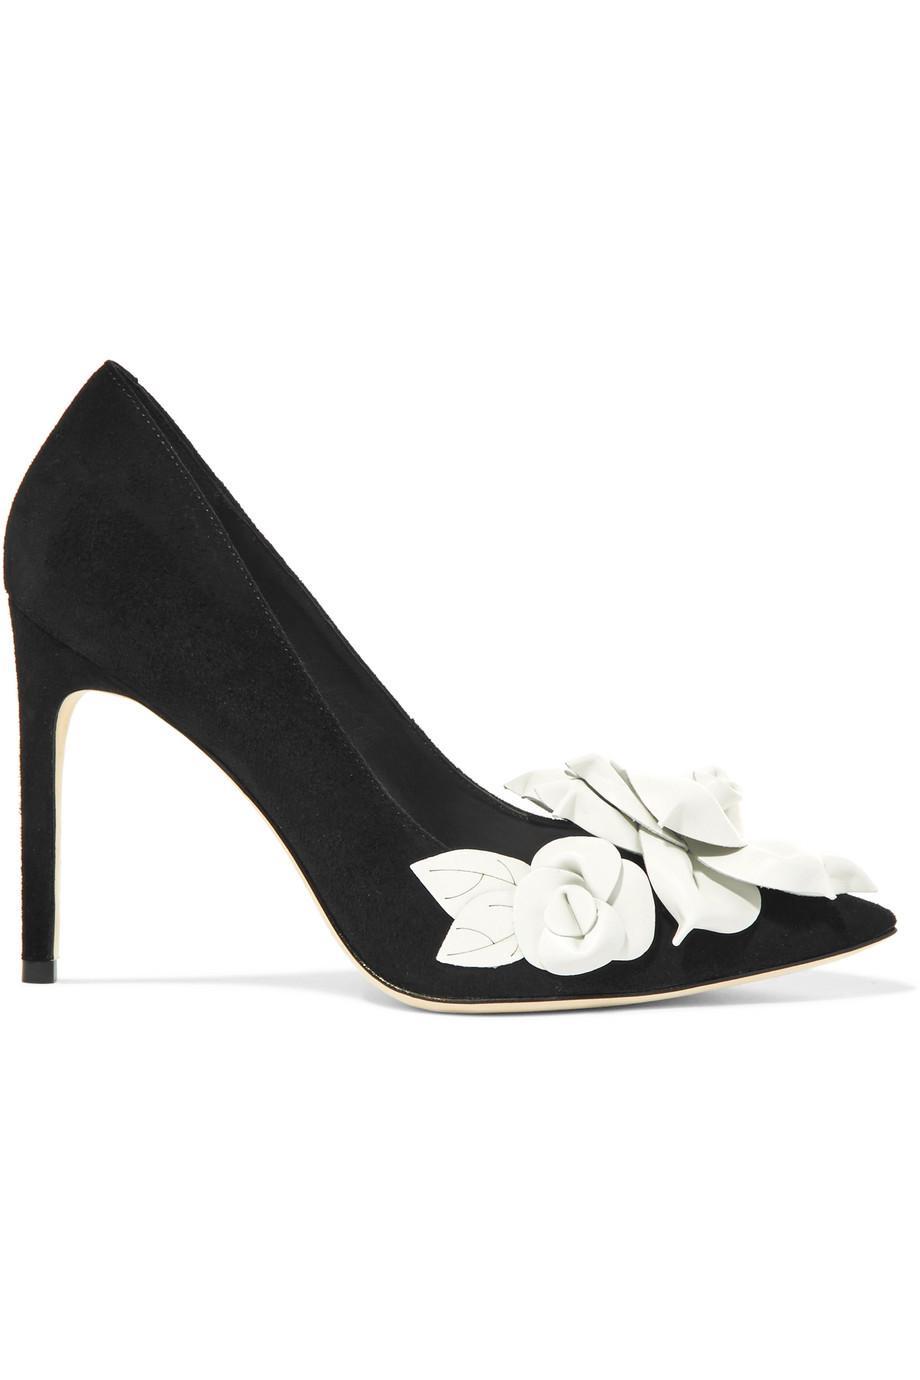 Jumbo Pompes En Daim Floral-lilico - Sophia Appliques Noir Webster ebYm85Ro